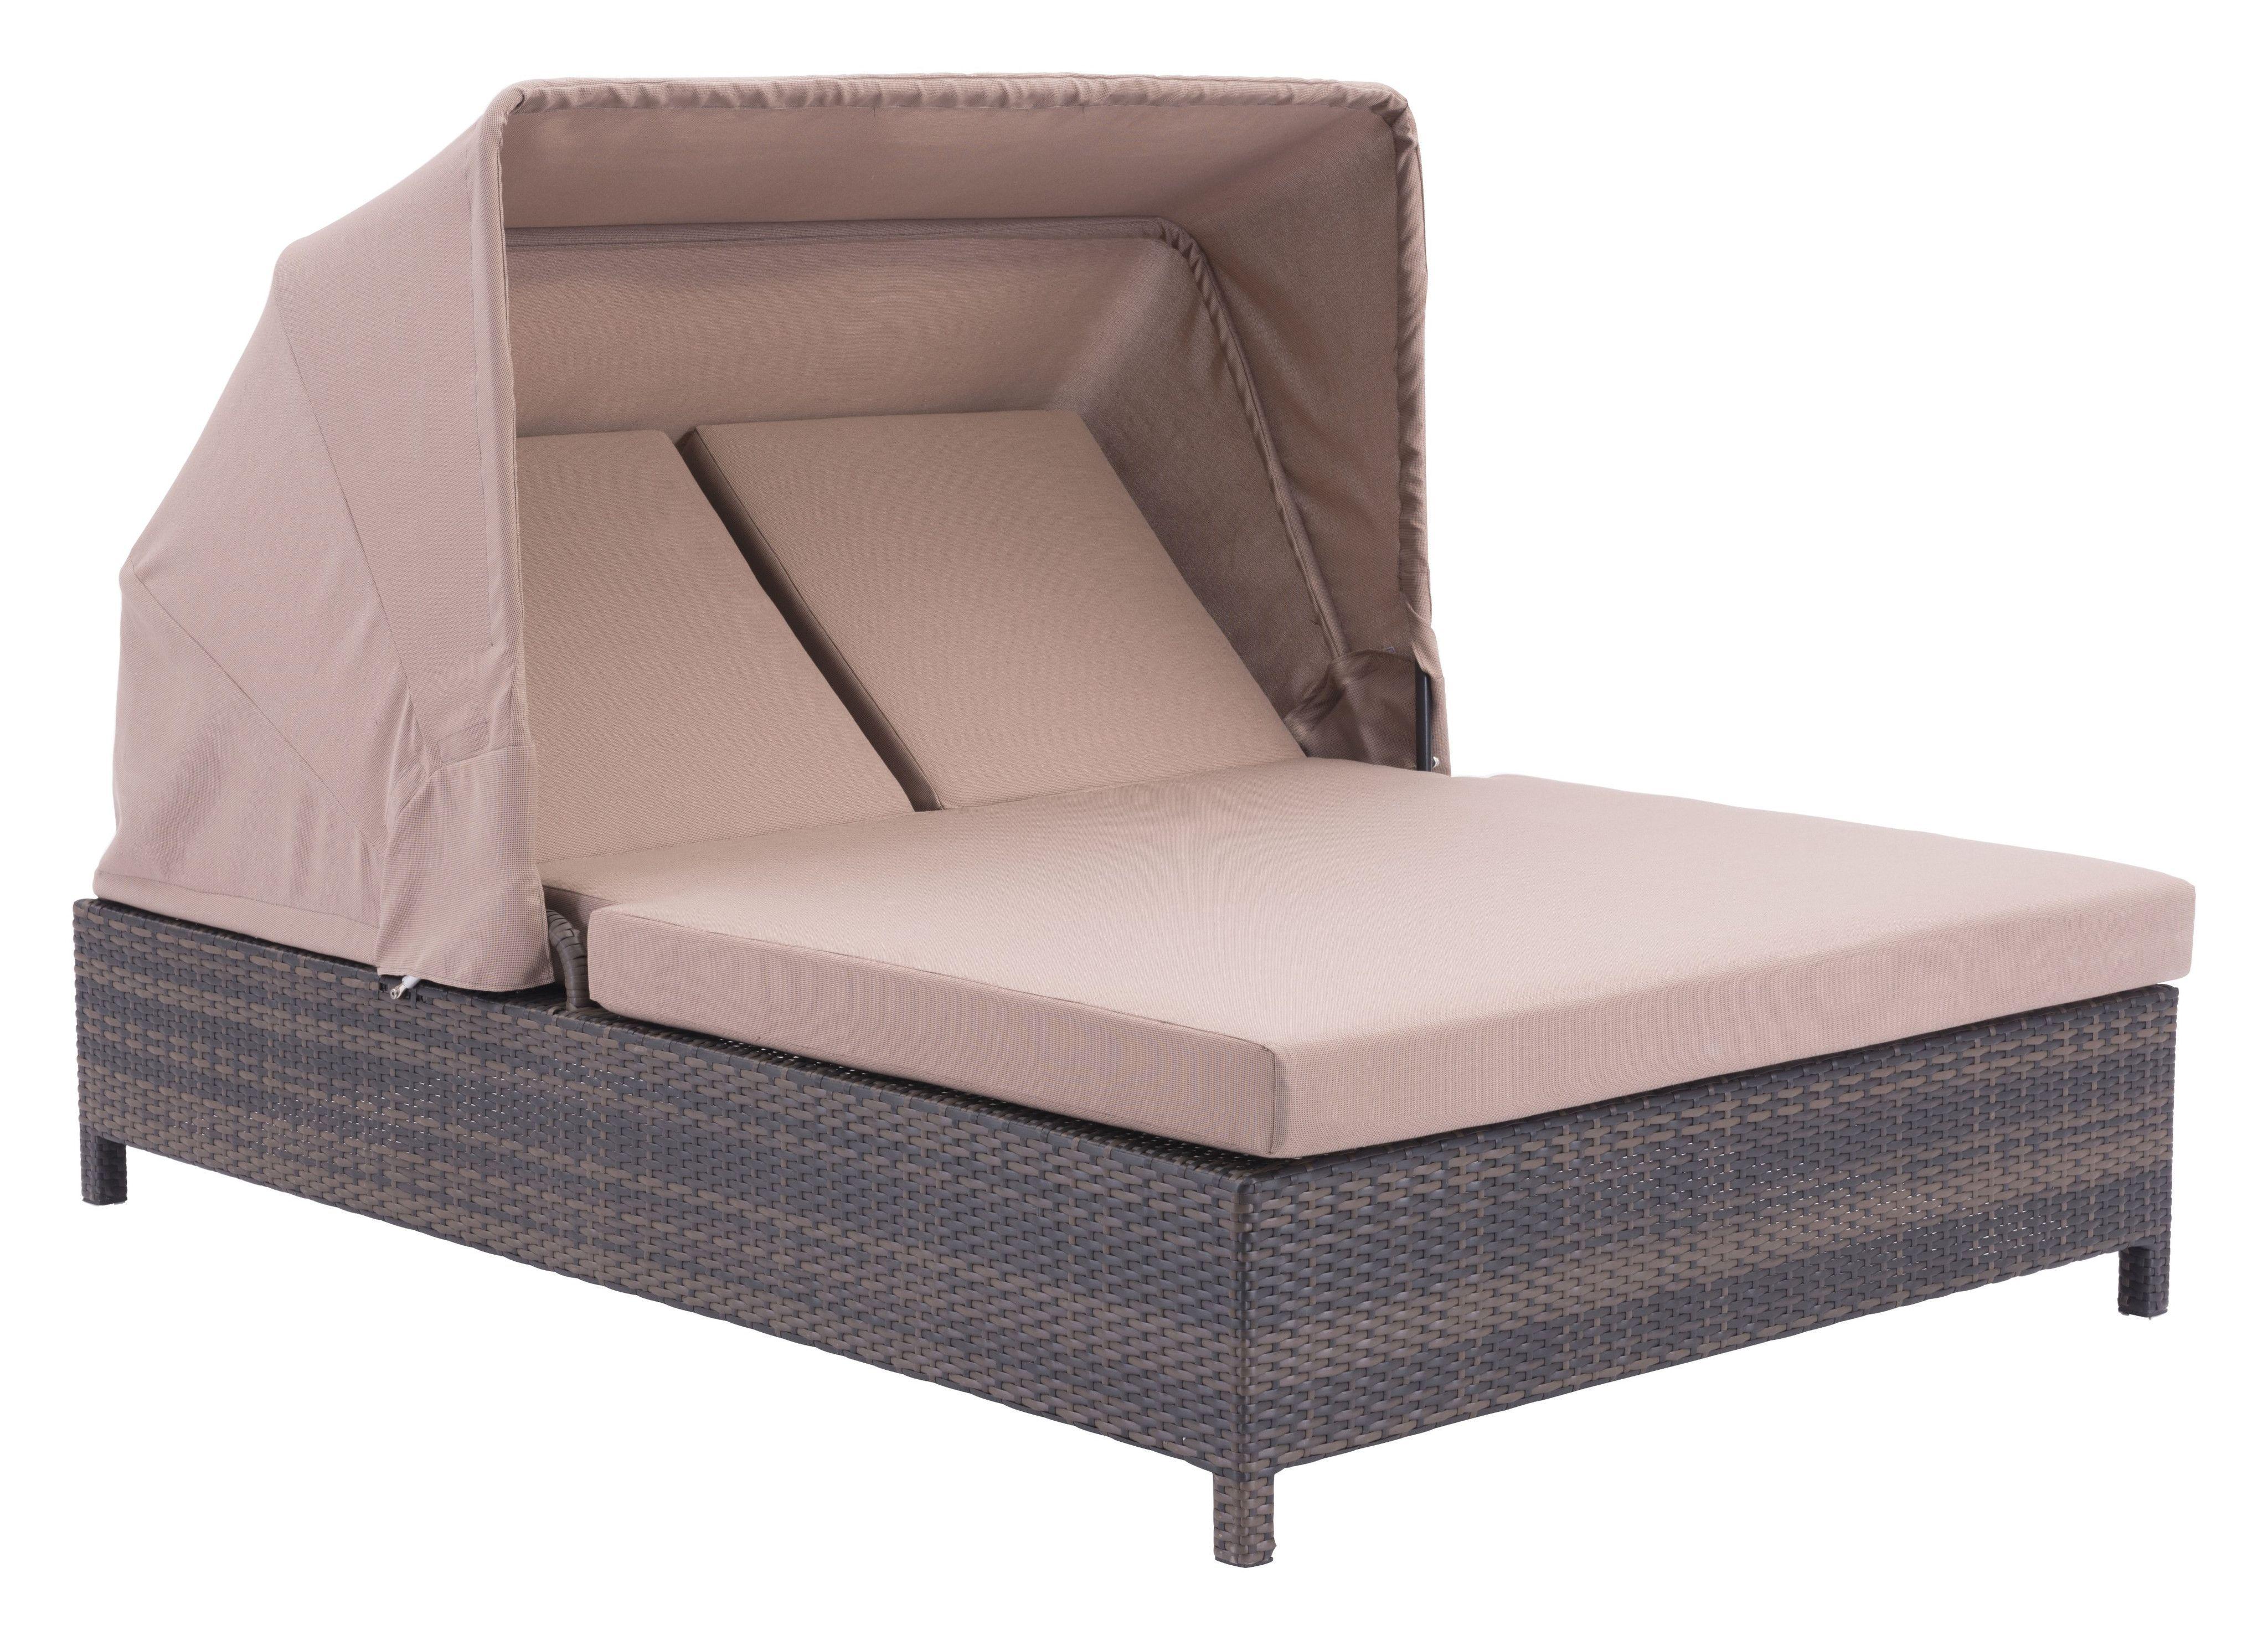 Prime Siesta Key Double Chaise Lounge Brown Beige Furniture Ibusinesslaw Wood Chair Design Ideas Ibusinesslaworg